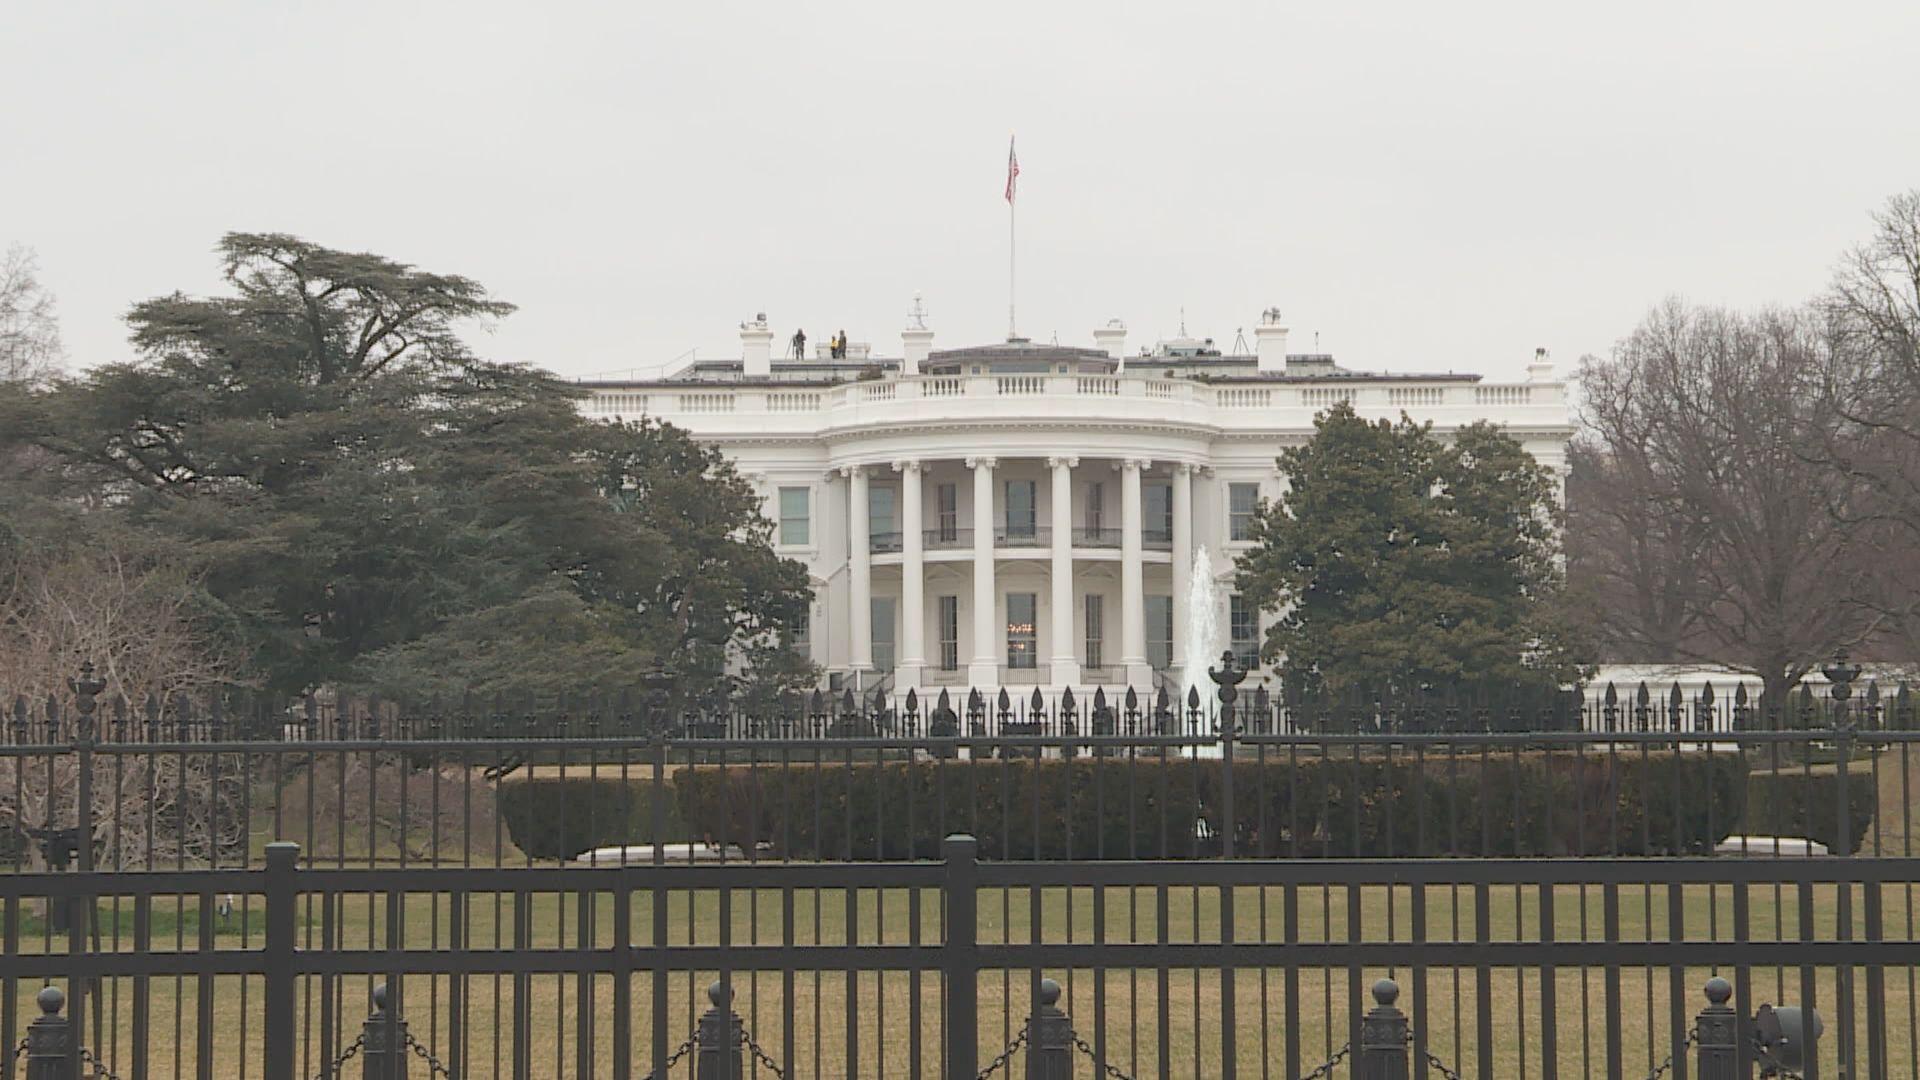 CBO料2020財年美國預算赤字高達3.3萬億美元